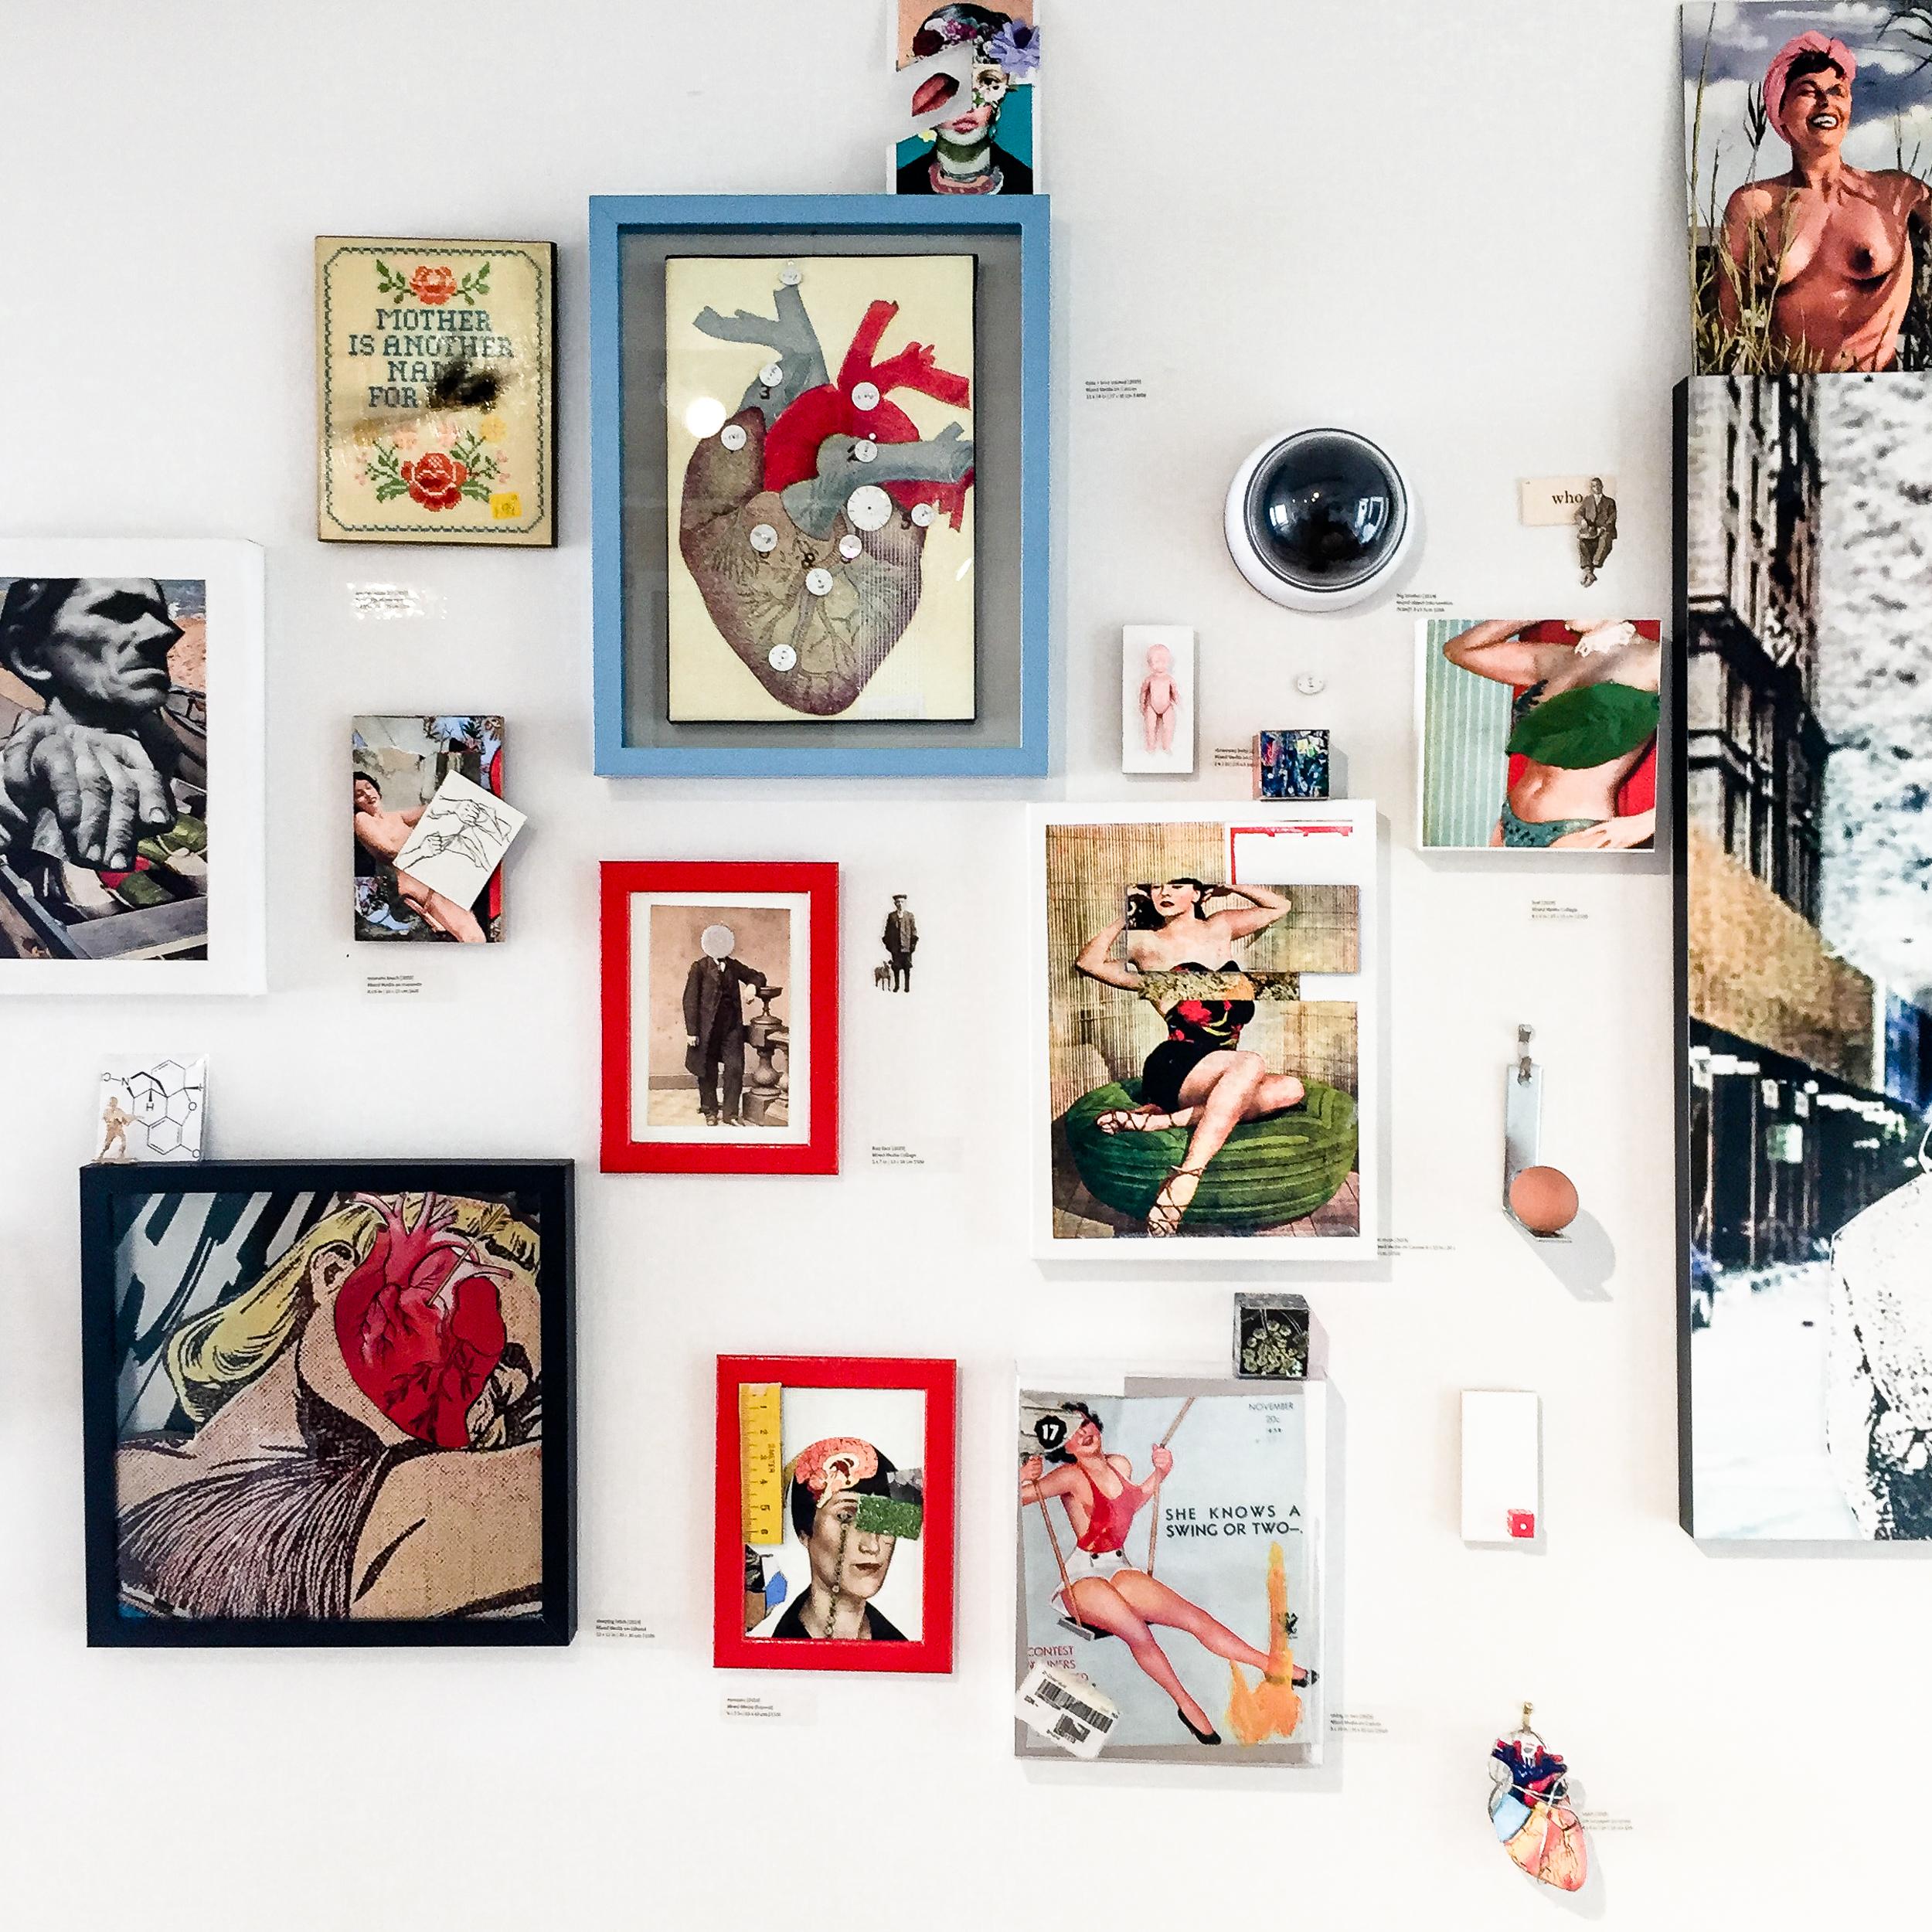 Faena-Exhibition-Images-87.jpg